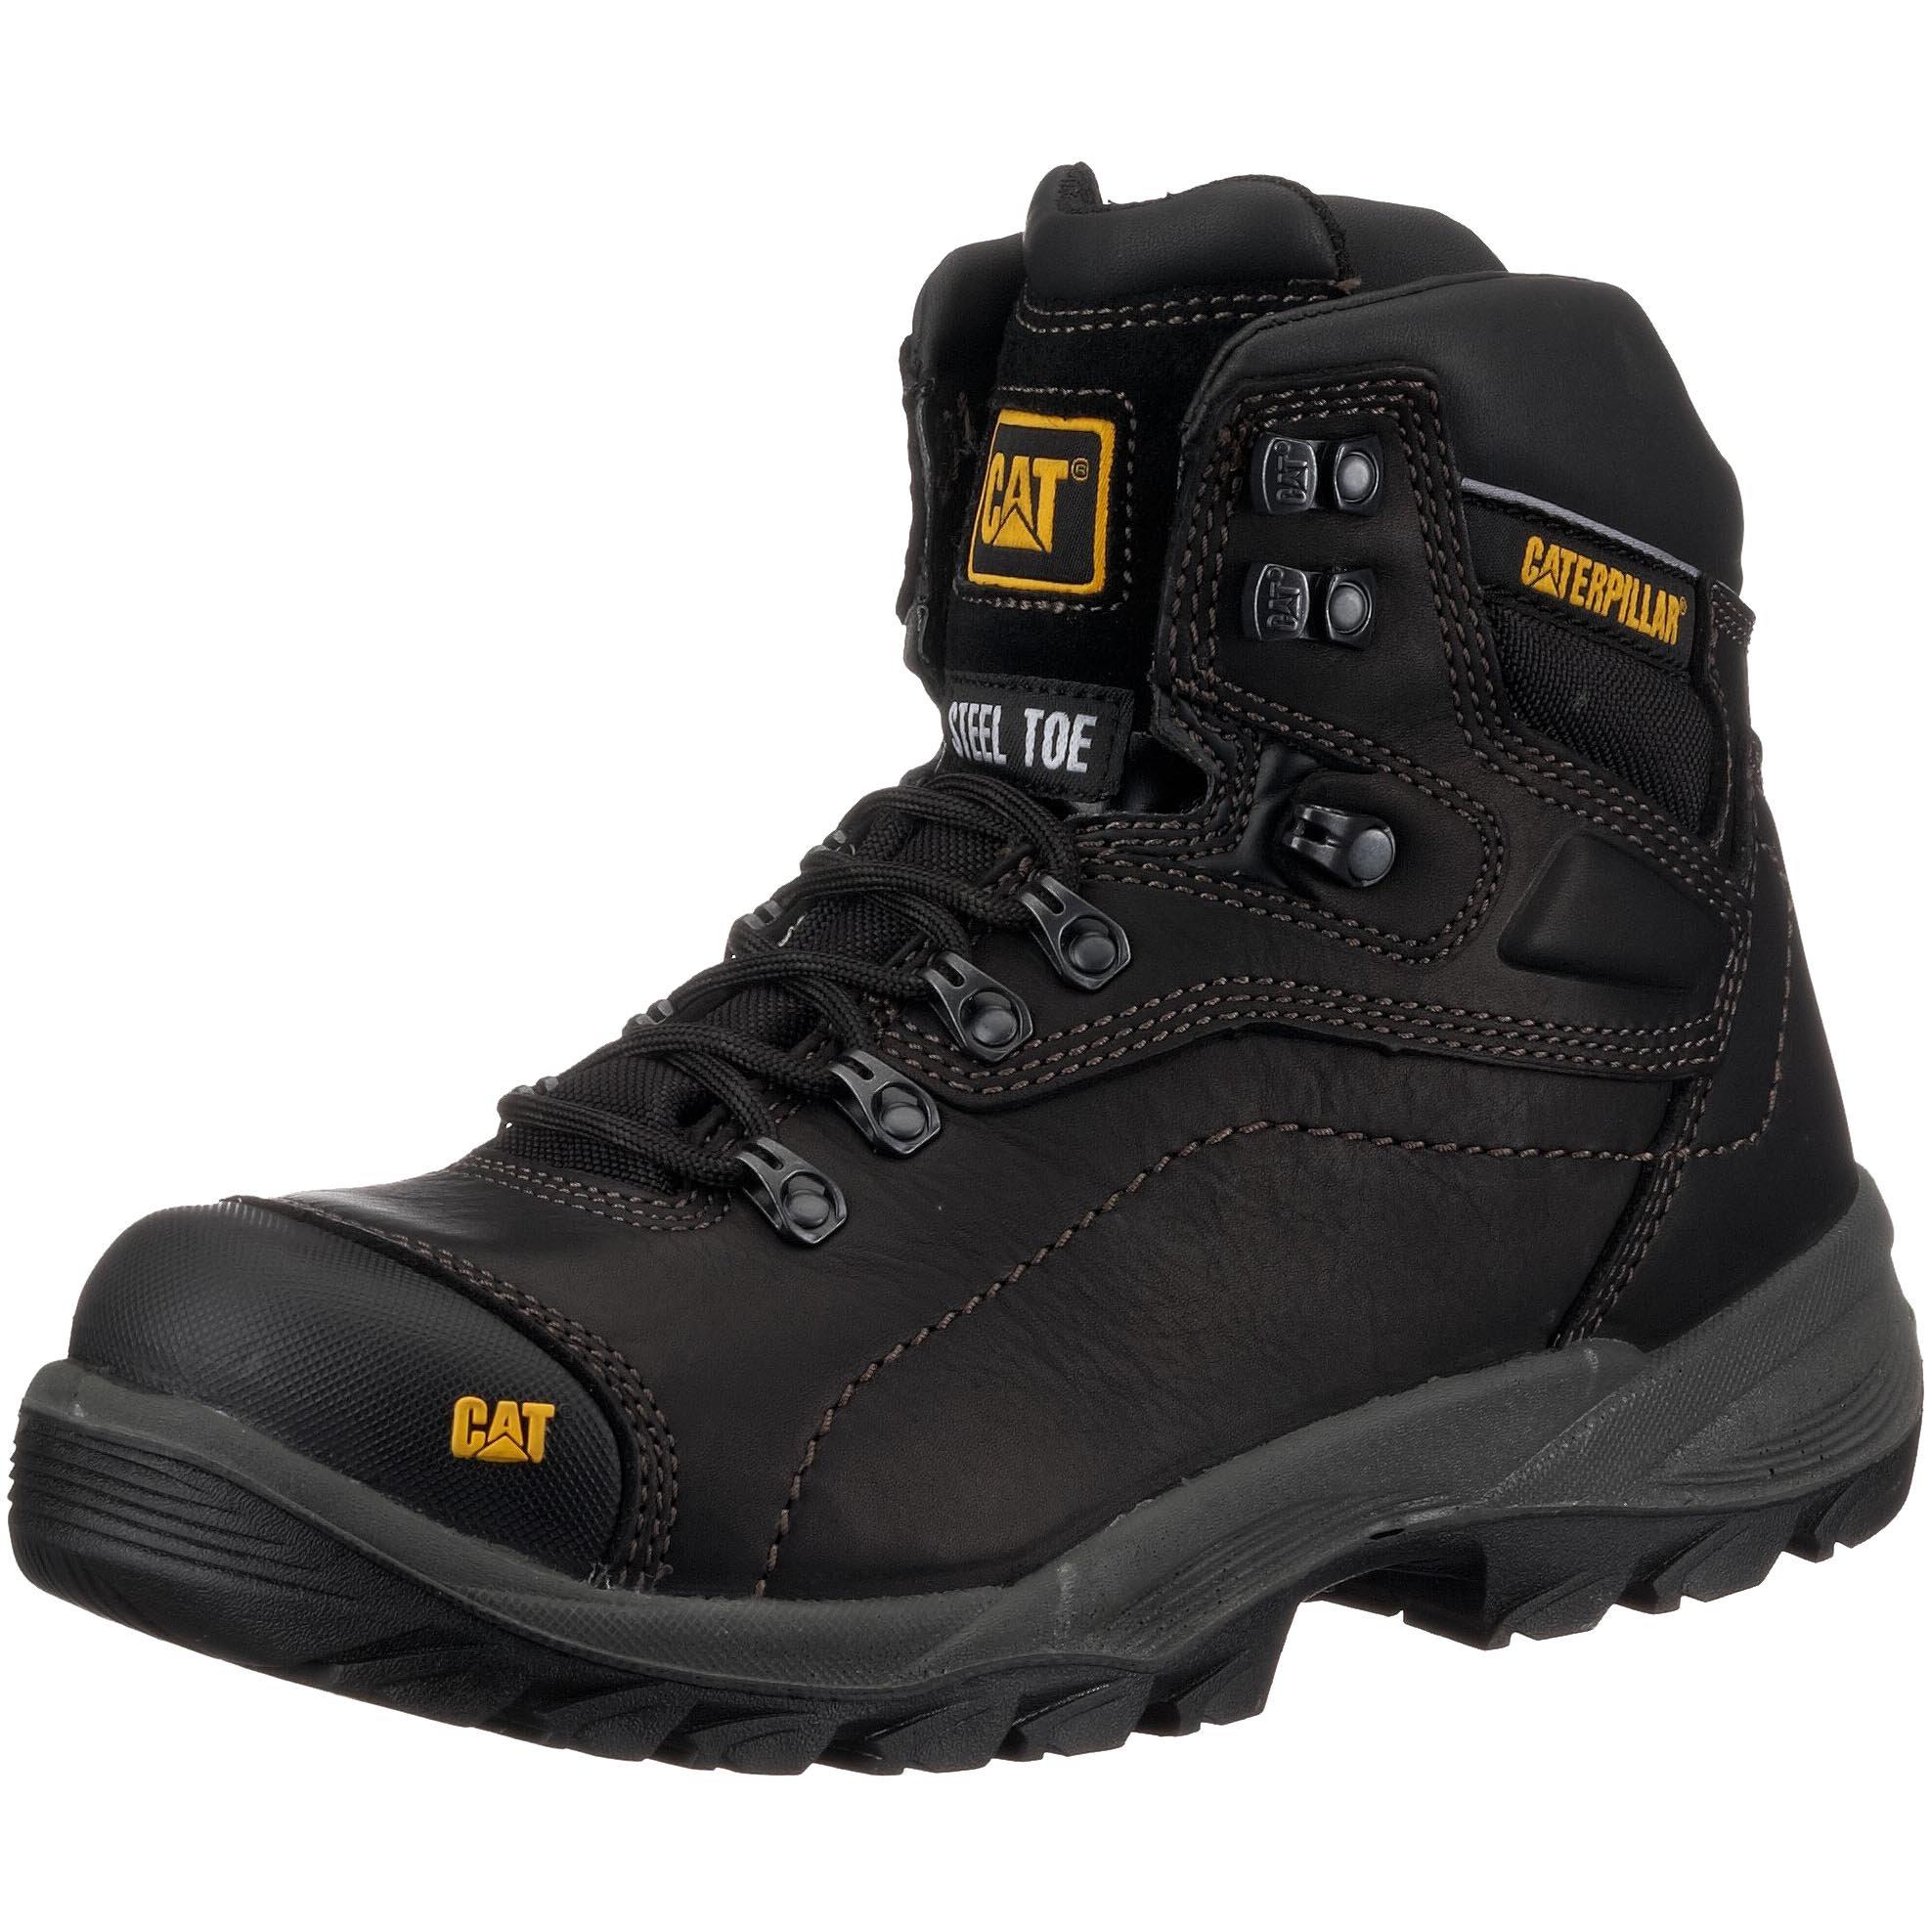 Diagnostic Hi S3 Safety Boots